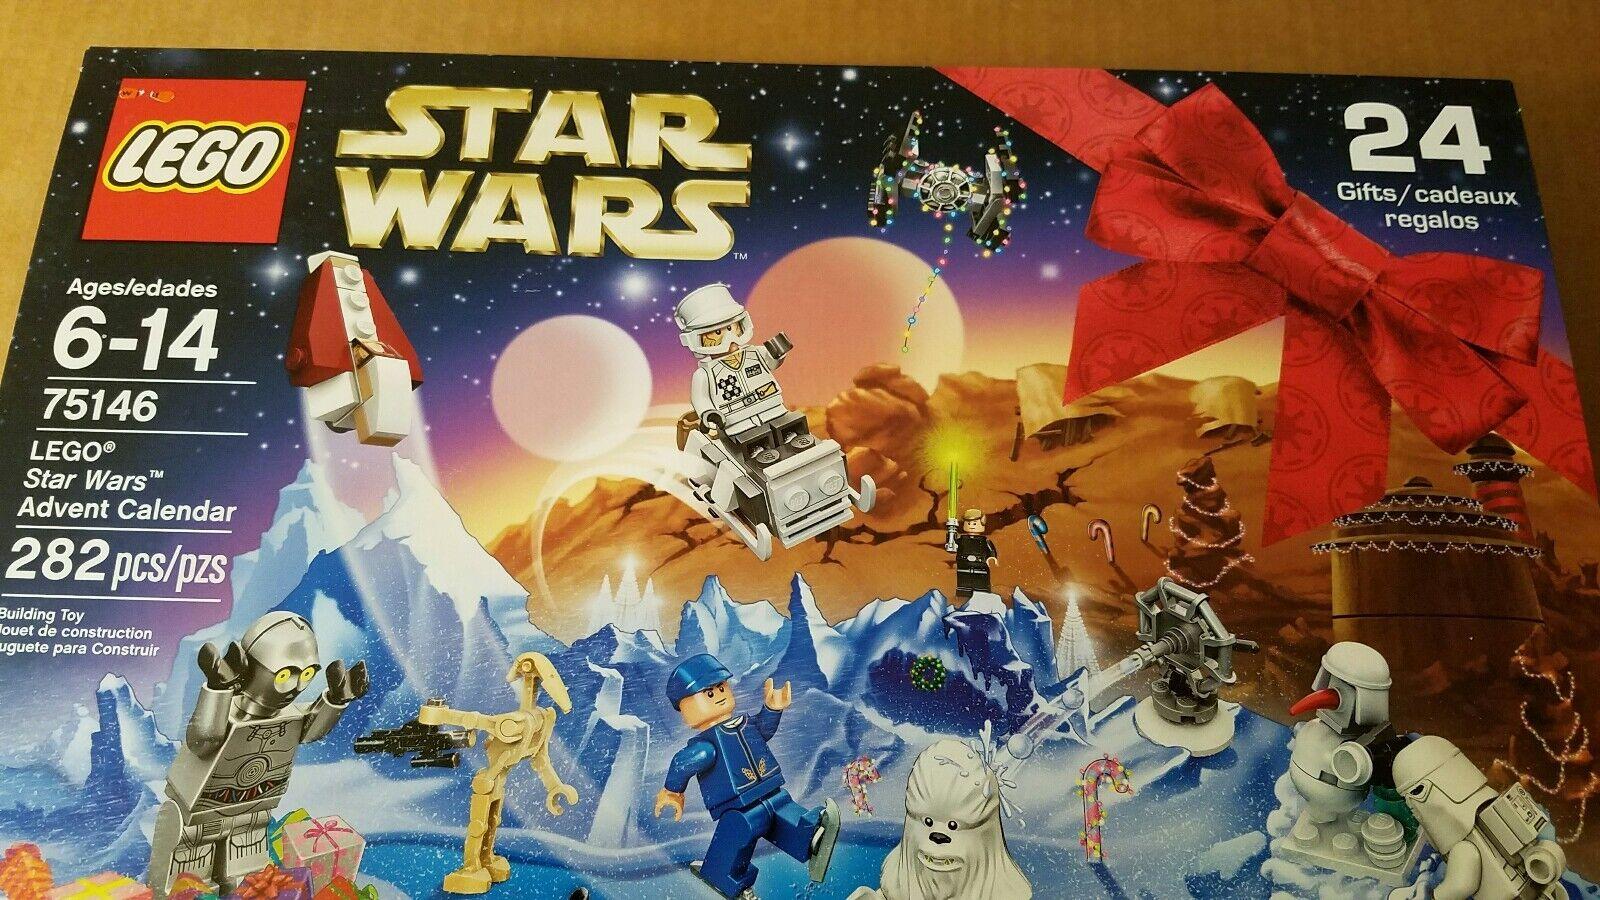 Lego Star Wars Advent Calendar 75146 New